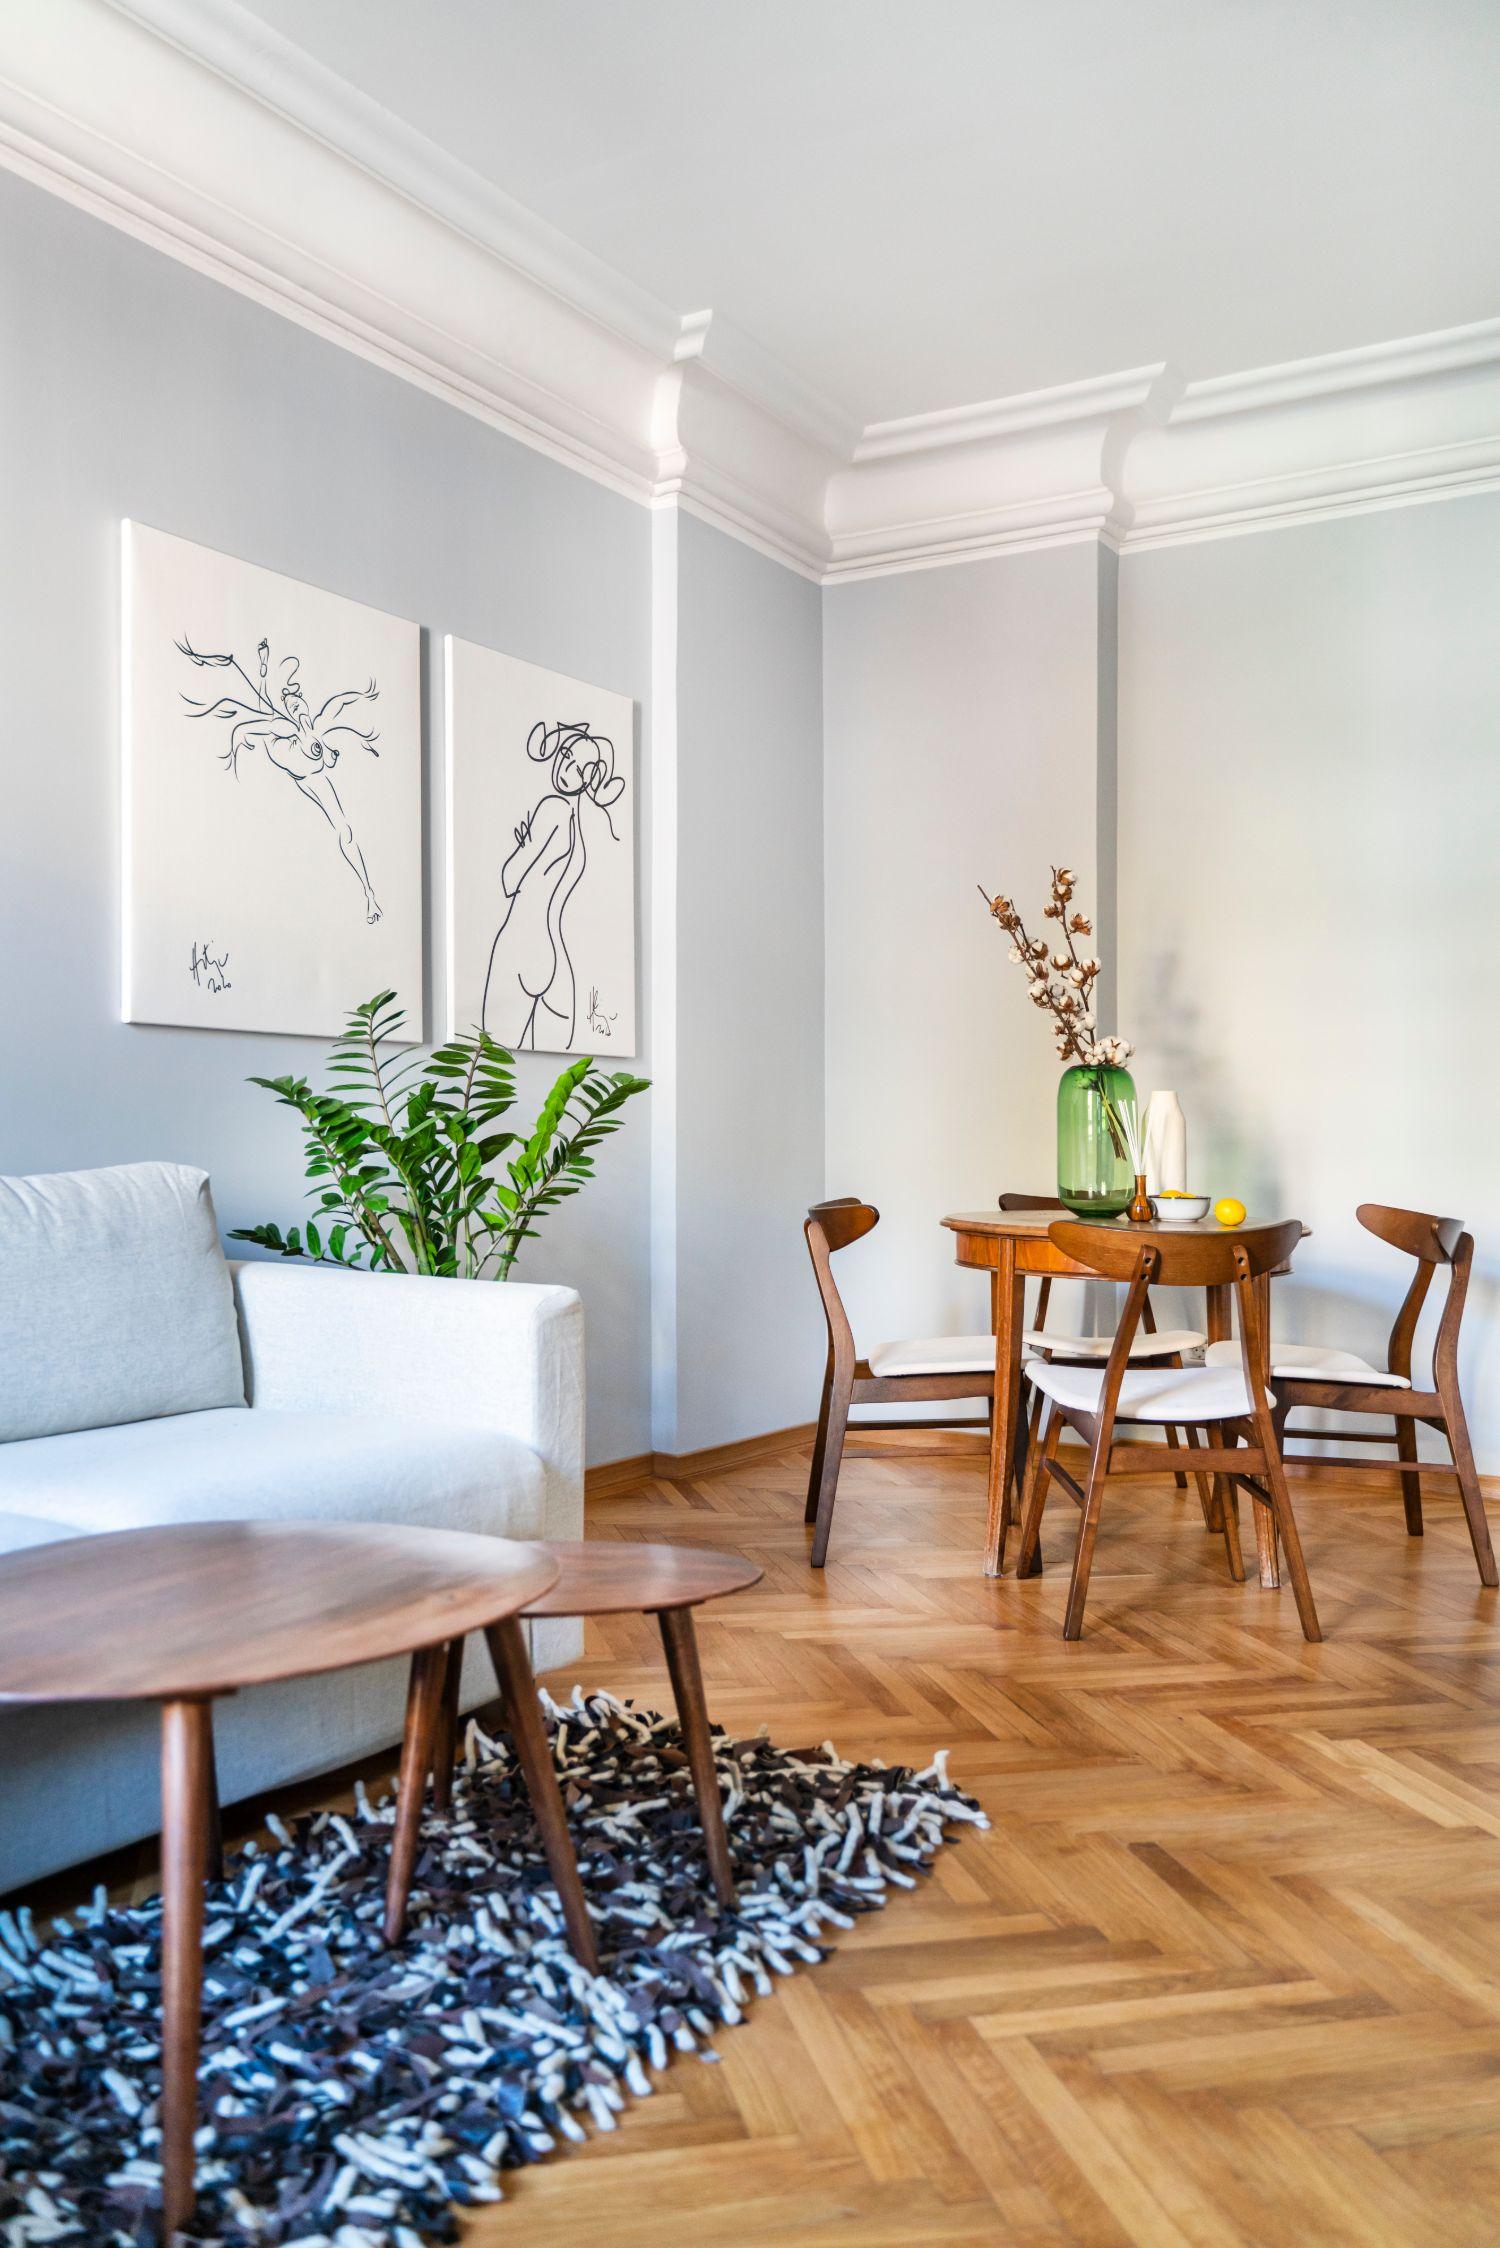 Living - renovare apartament vechi Amzei Kanso Design arh. Andra Bica (3)